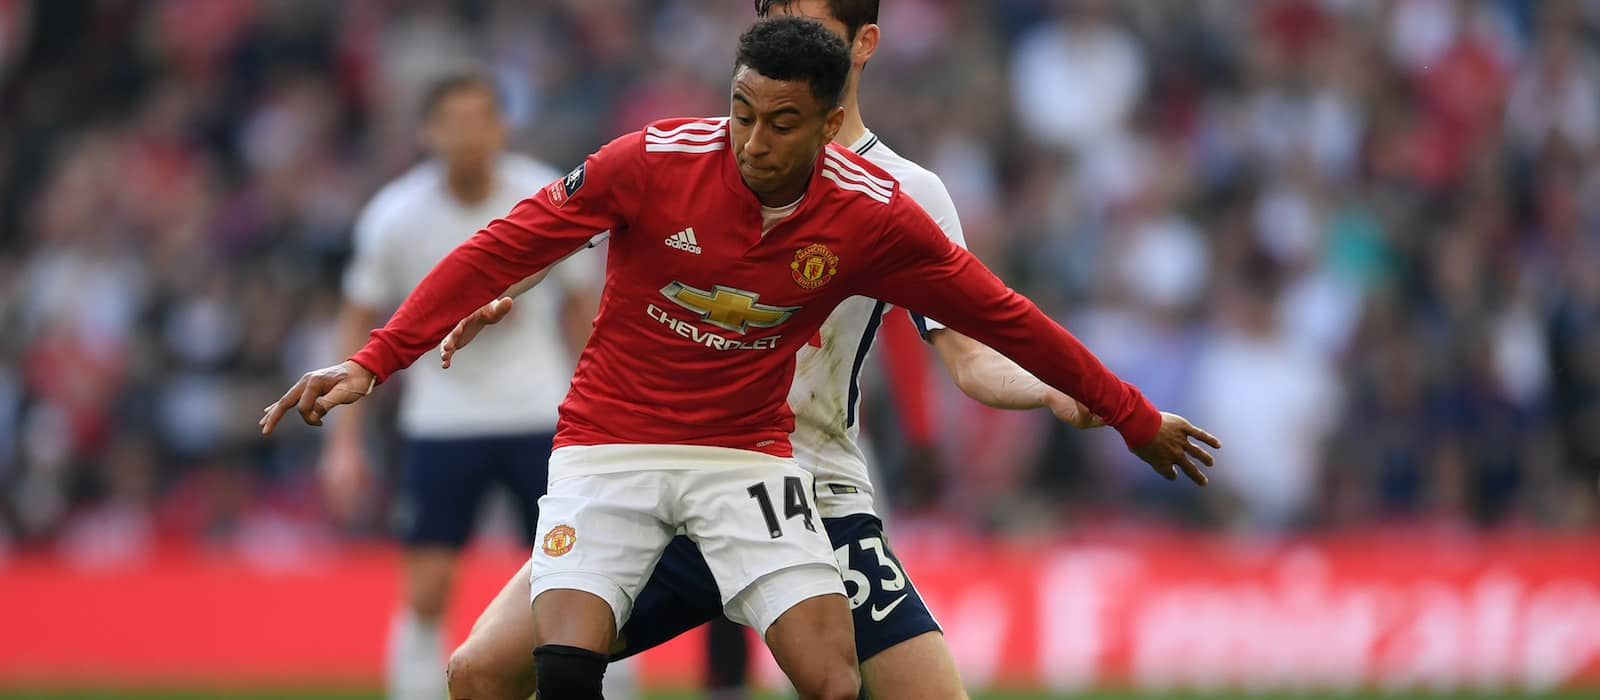 Manchester United hoping for Jesse Lingard return after international break for Chelsea game – report